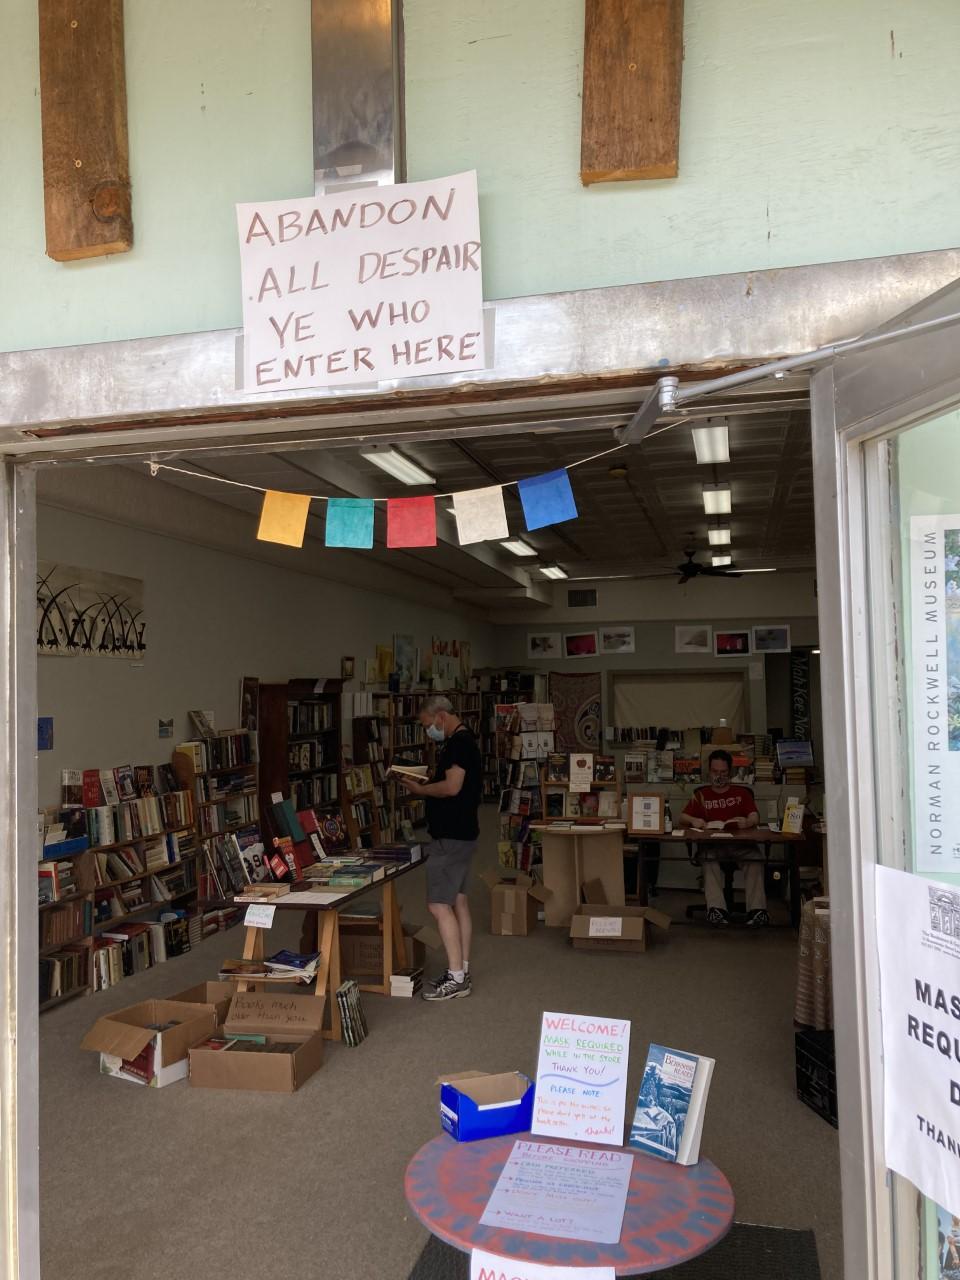 Dante-in-the-Berkshires-Abandon-All-Despair-Bookstore-Sign